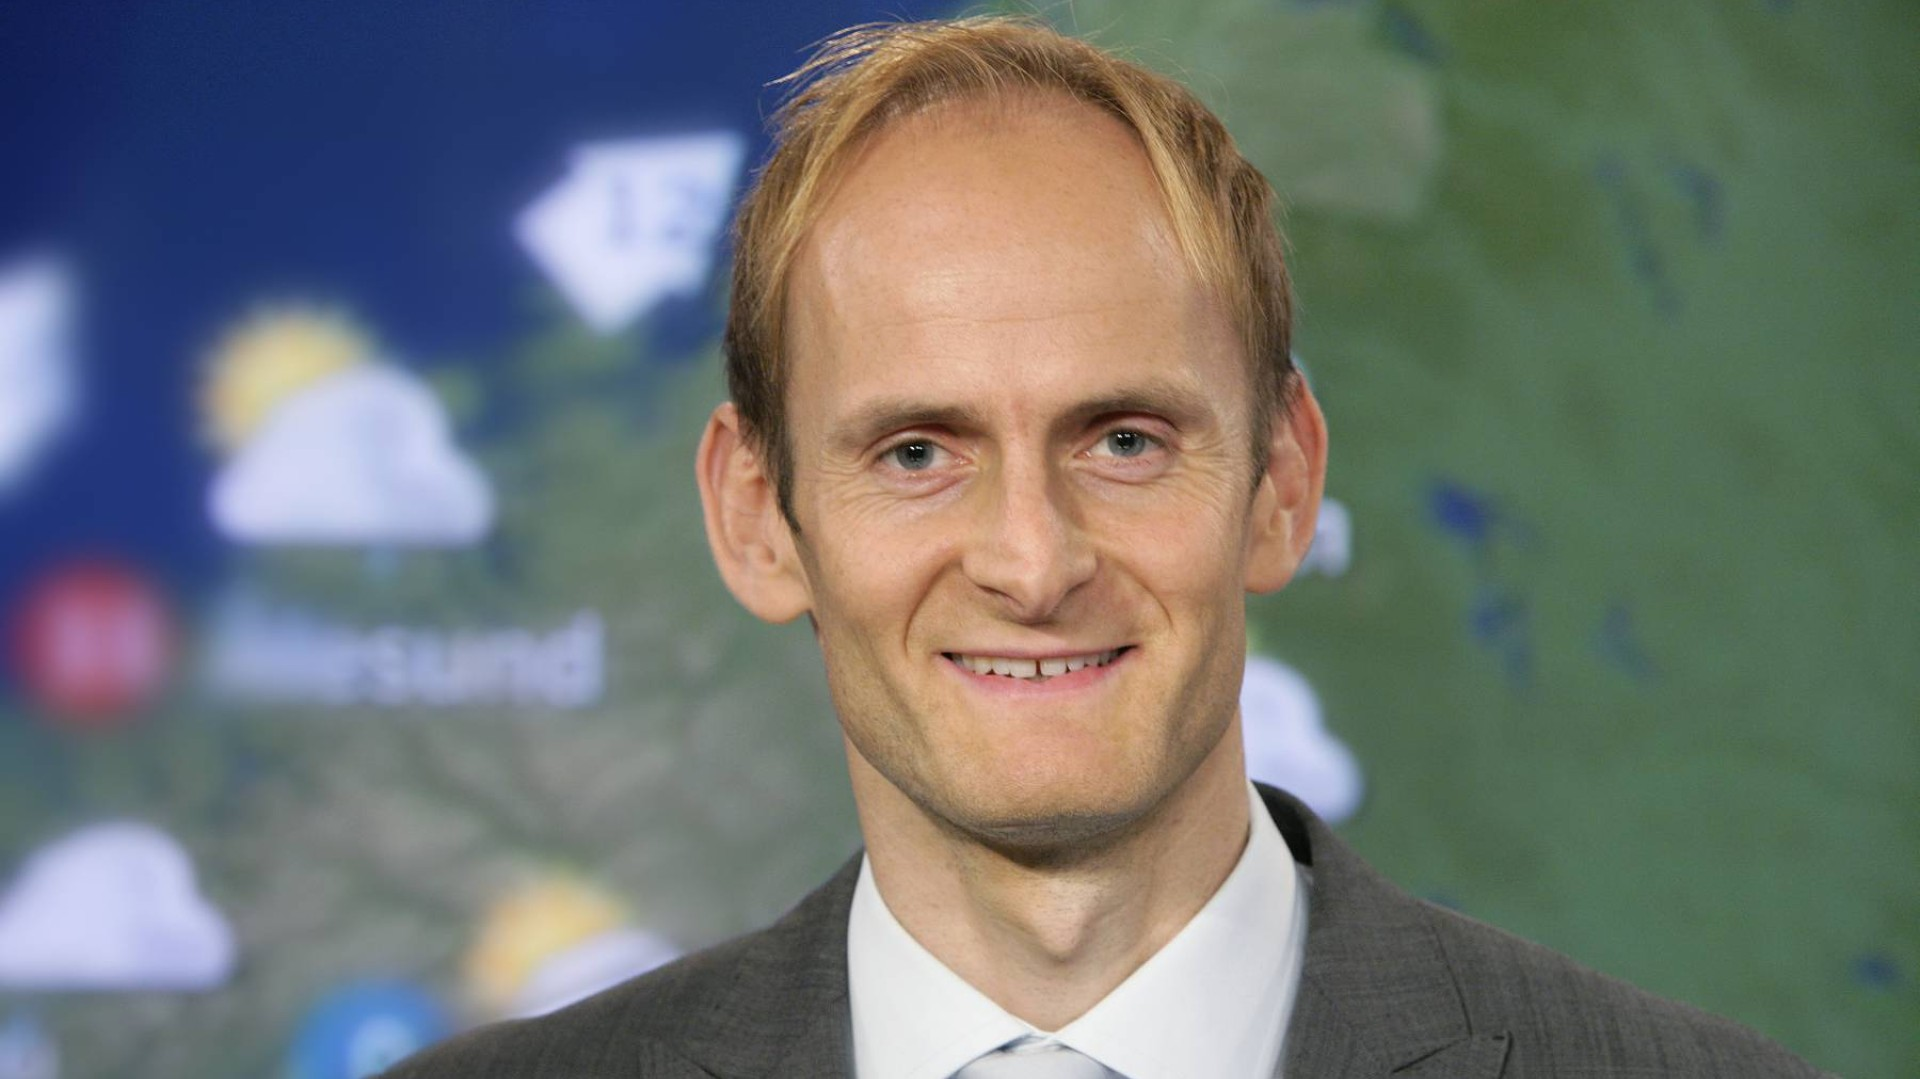 Terje Alsvik Walløe